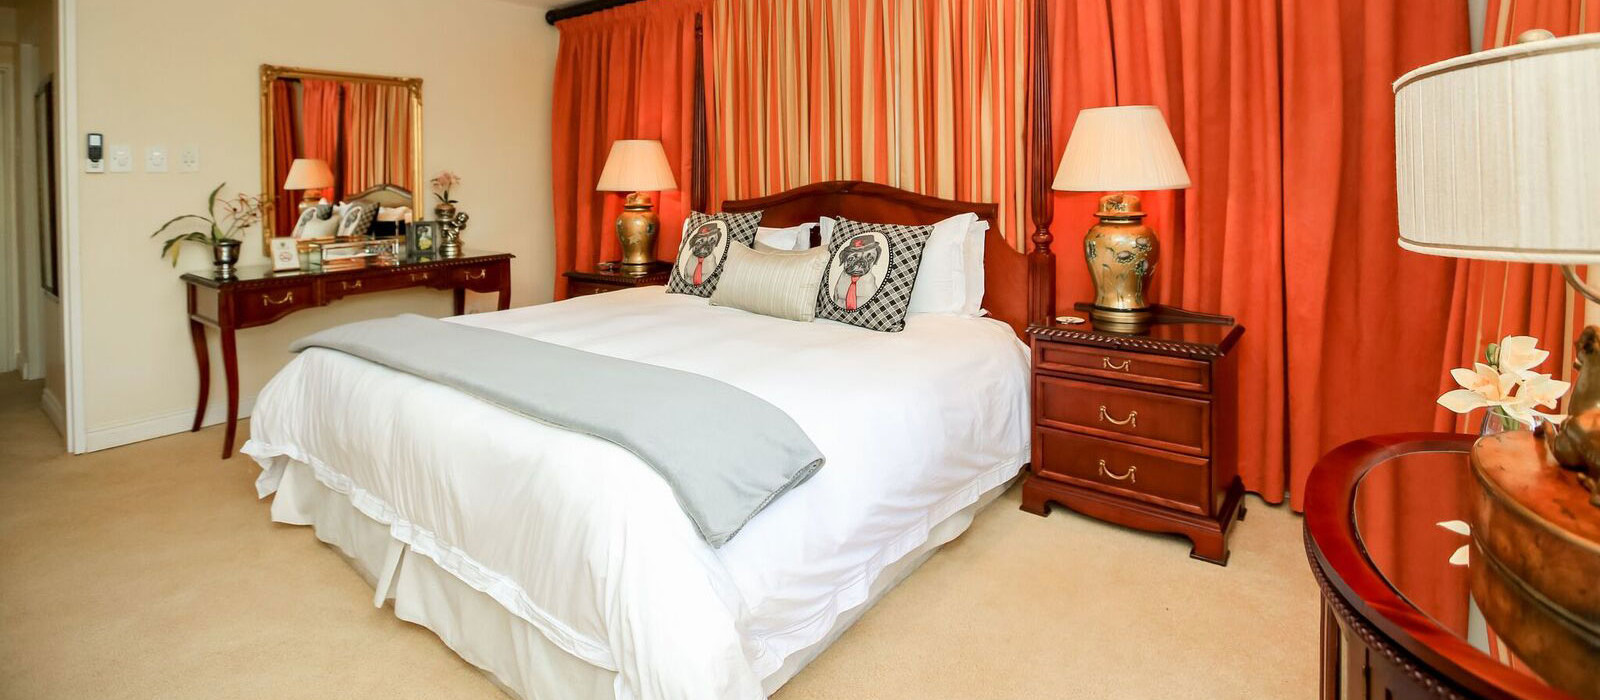 Hotel Summerfield Botanical Garden & Exclusive Resort Swasiland